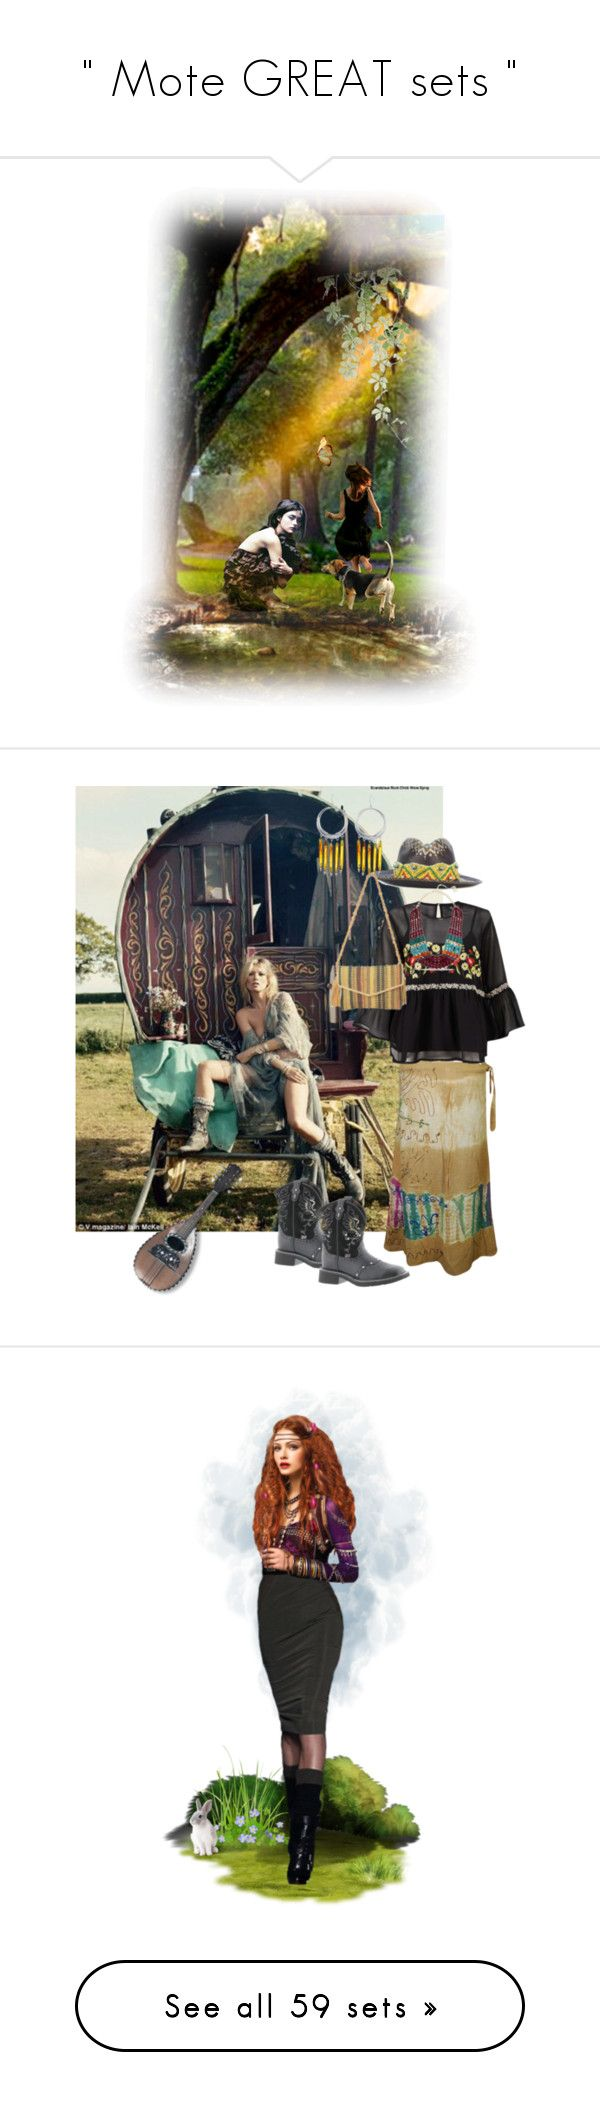 """ Mote GREAT sets "" by catyravenwood ❤ liked on Polyvore featuring art, gypsy, mygypsysoul, mygysysoul, modern, Night, stars, dollset, artset and J Brand"